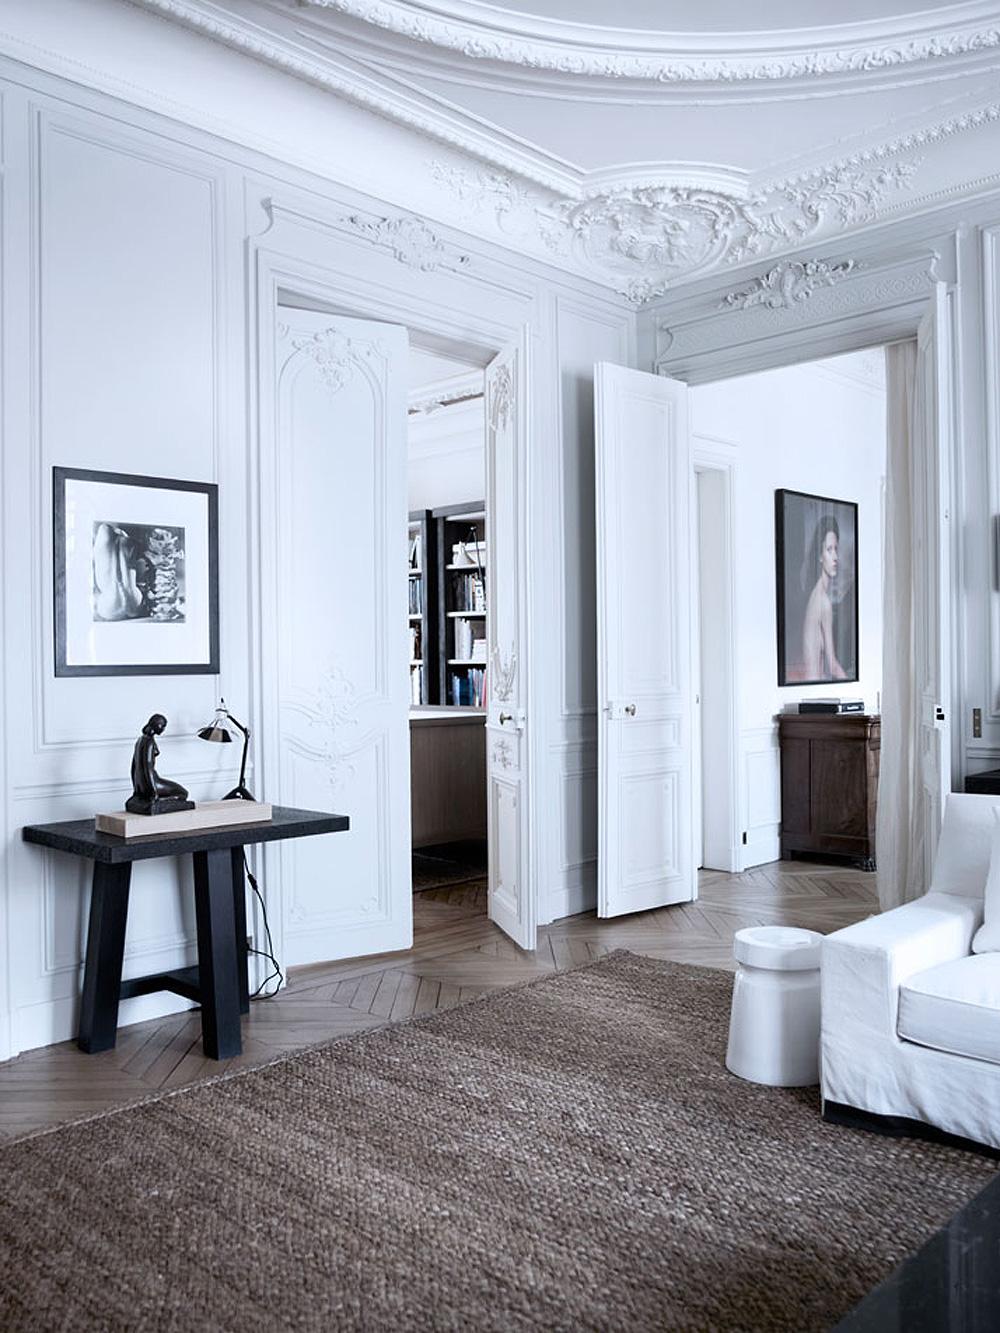 Paris-Apartment-Tour-Art-5.jpg